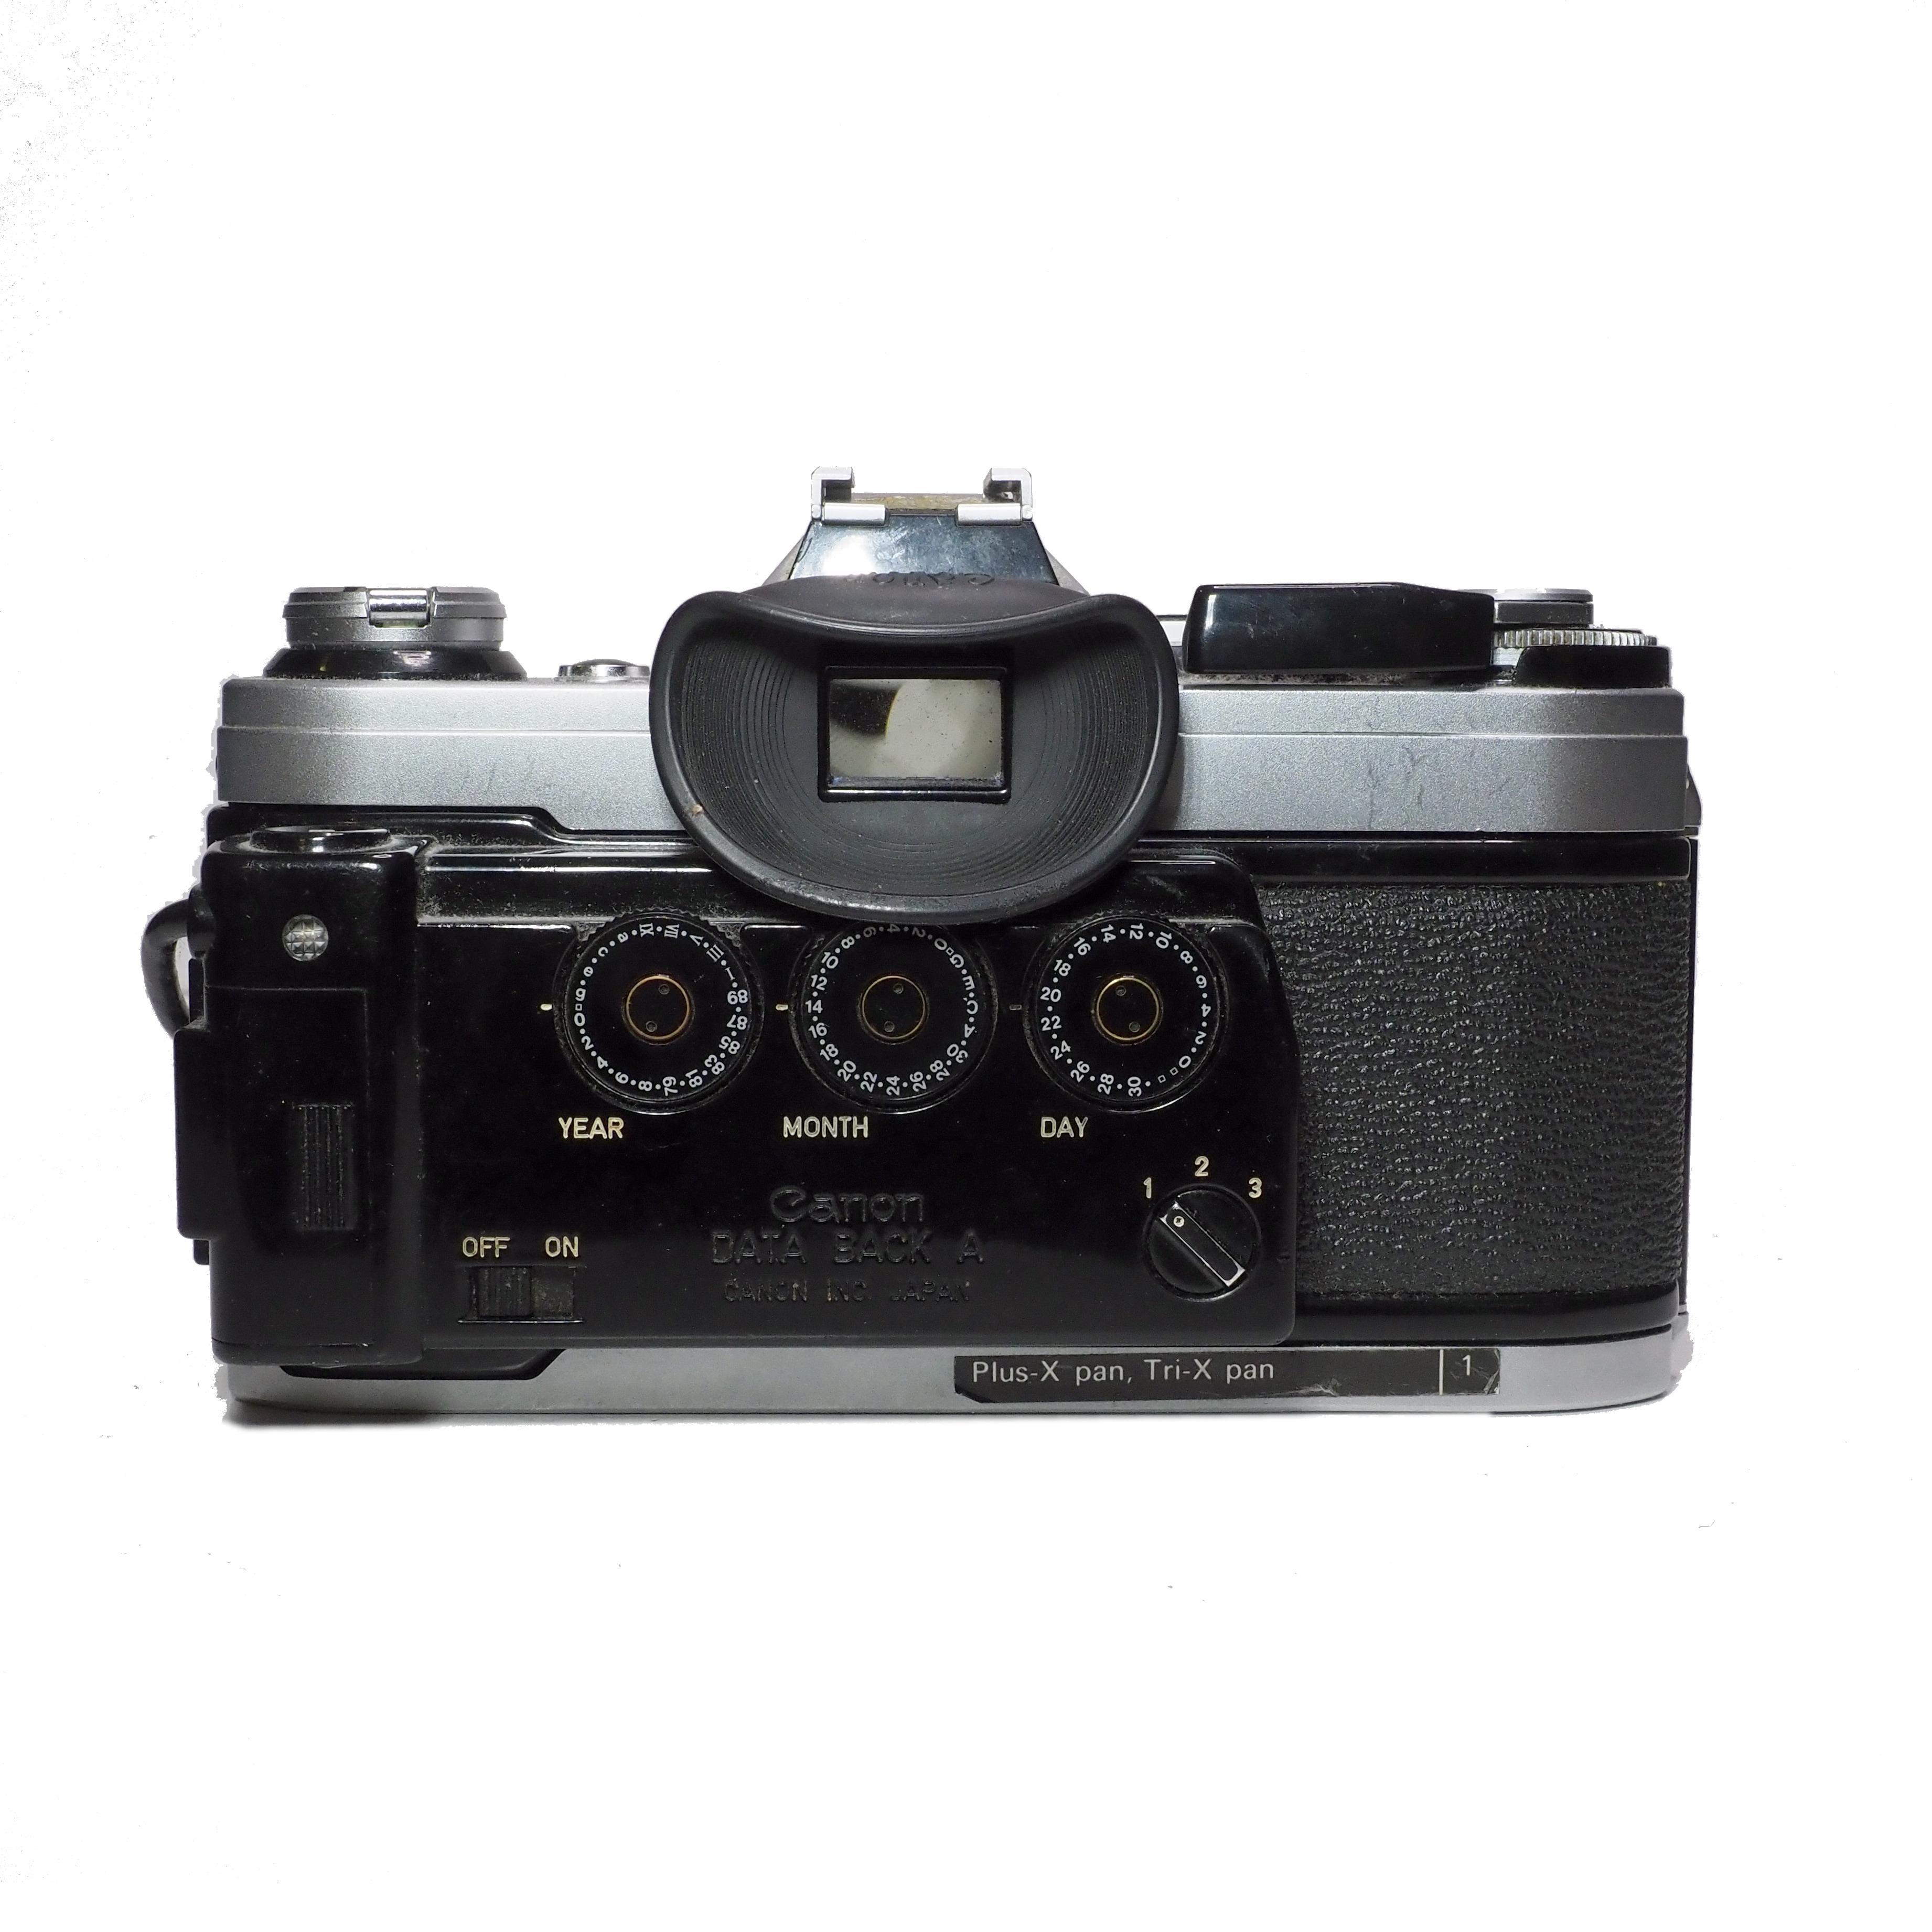 Canon AE-1 + FD 35-70mm f/3,5-4,5 - BEGAGNAT